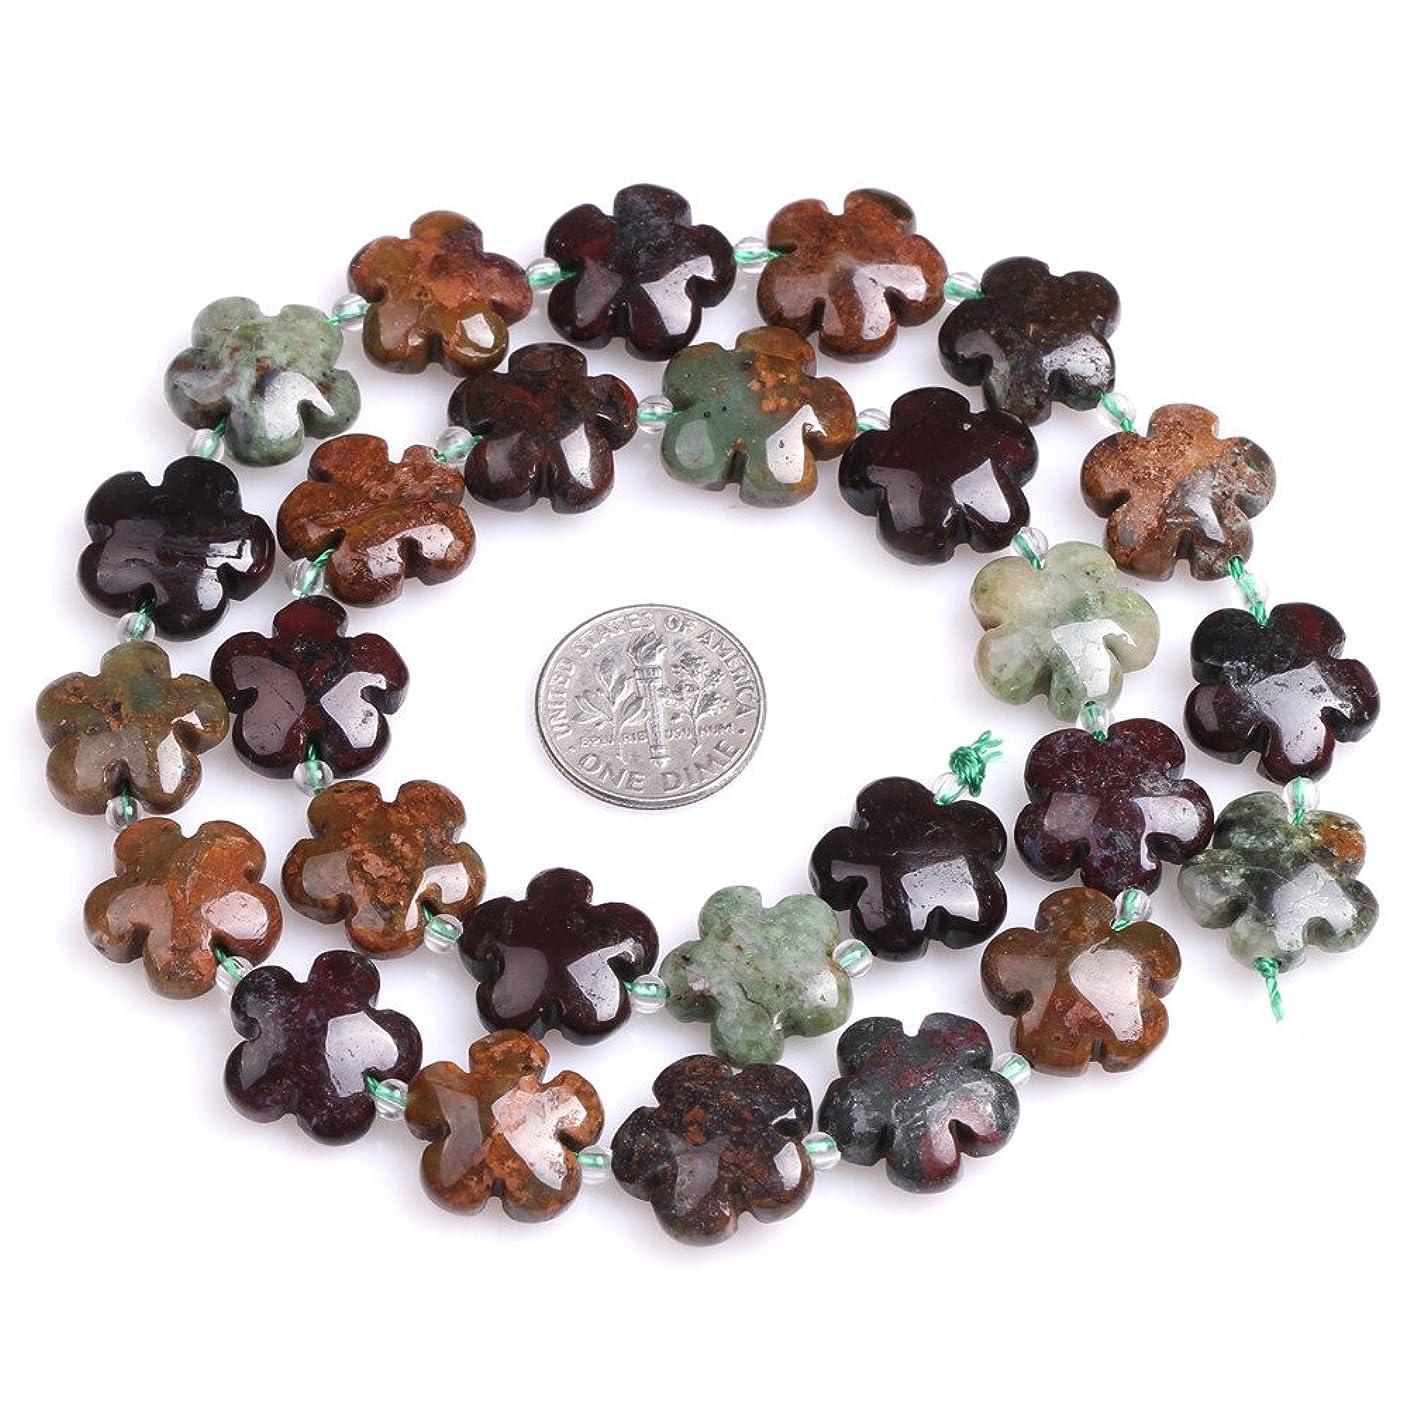 Ocean Agate Beads for Jewelry Making Natural Semi Precious Gemstone 15mm Flower Shape Strand 15